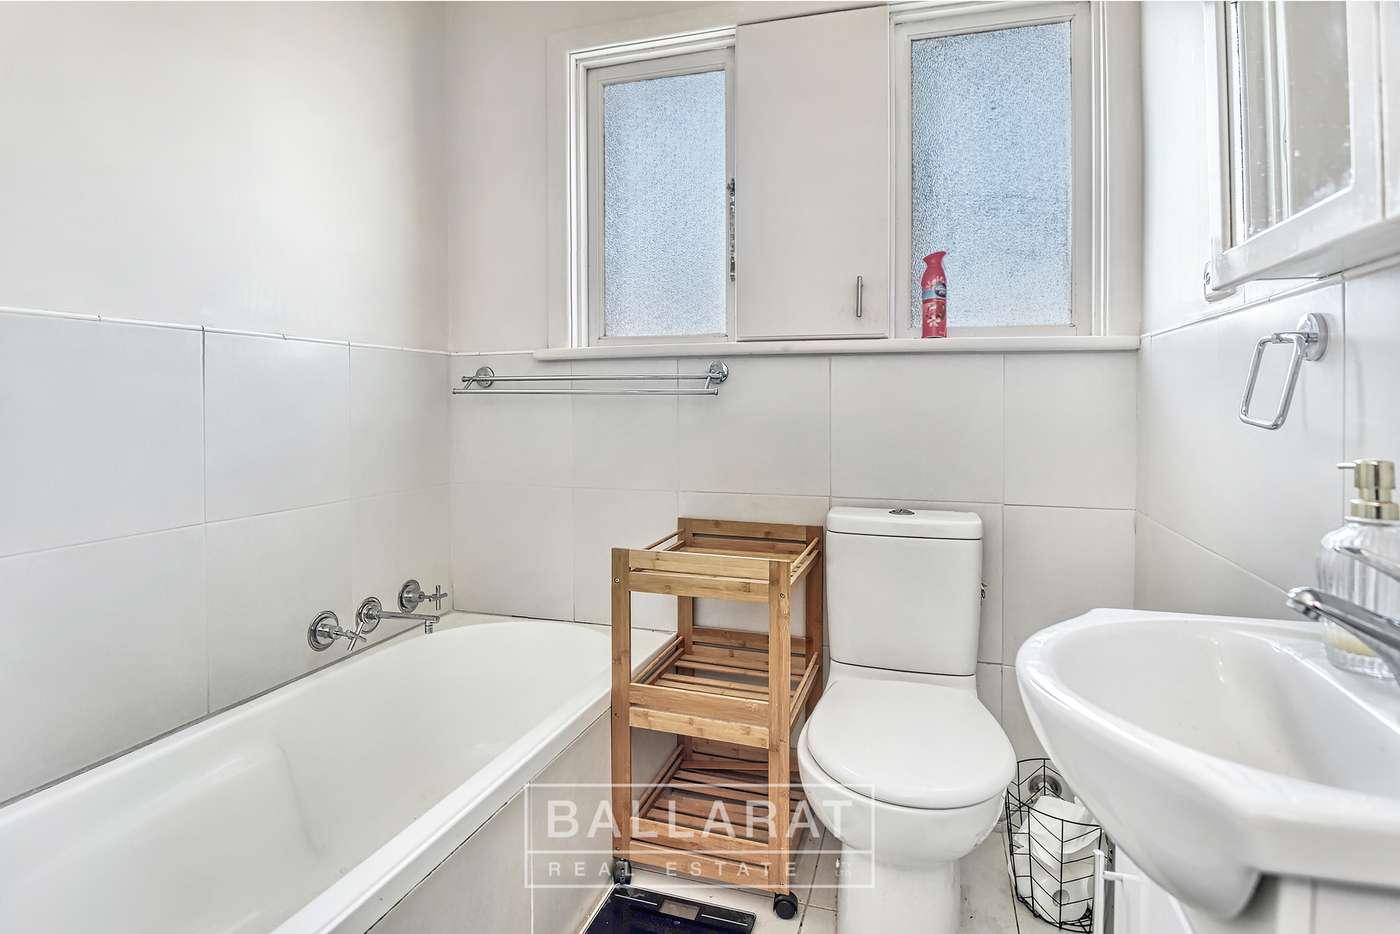 Sixth view of Homely house listing, 18 Spencer Street, Sebastopol VIC 3356